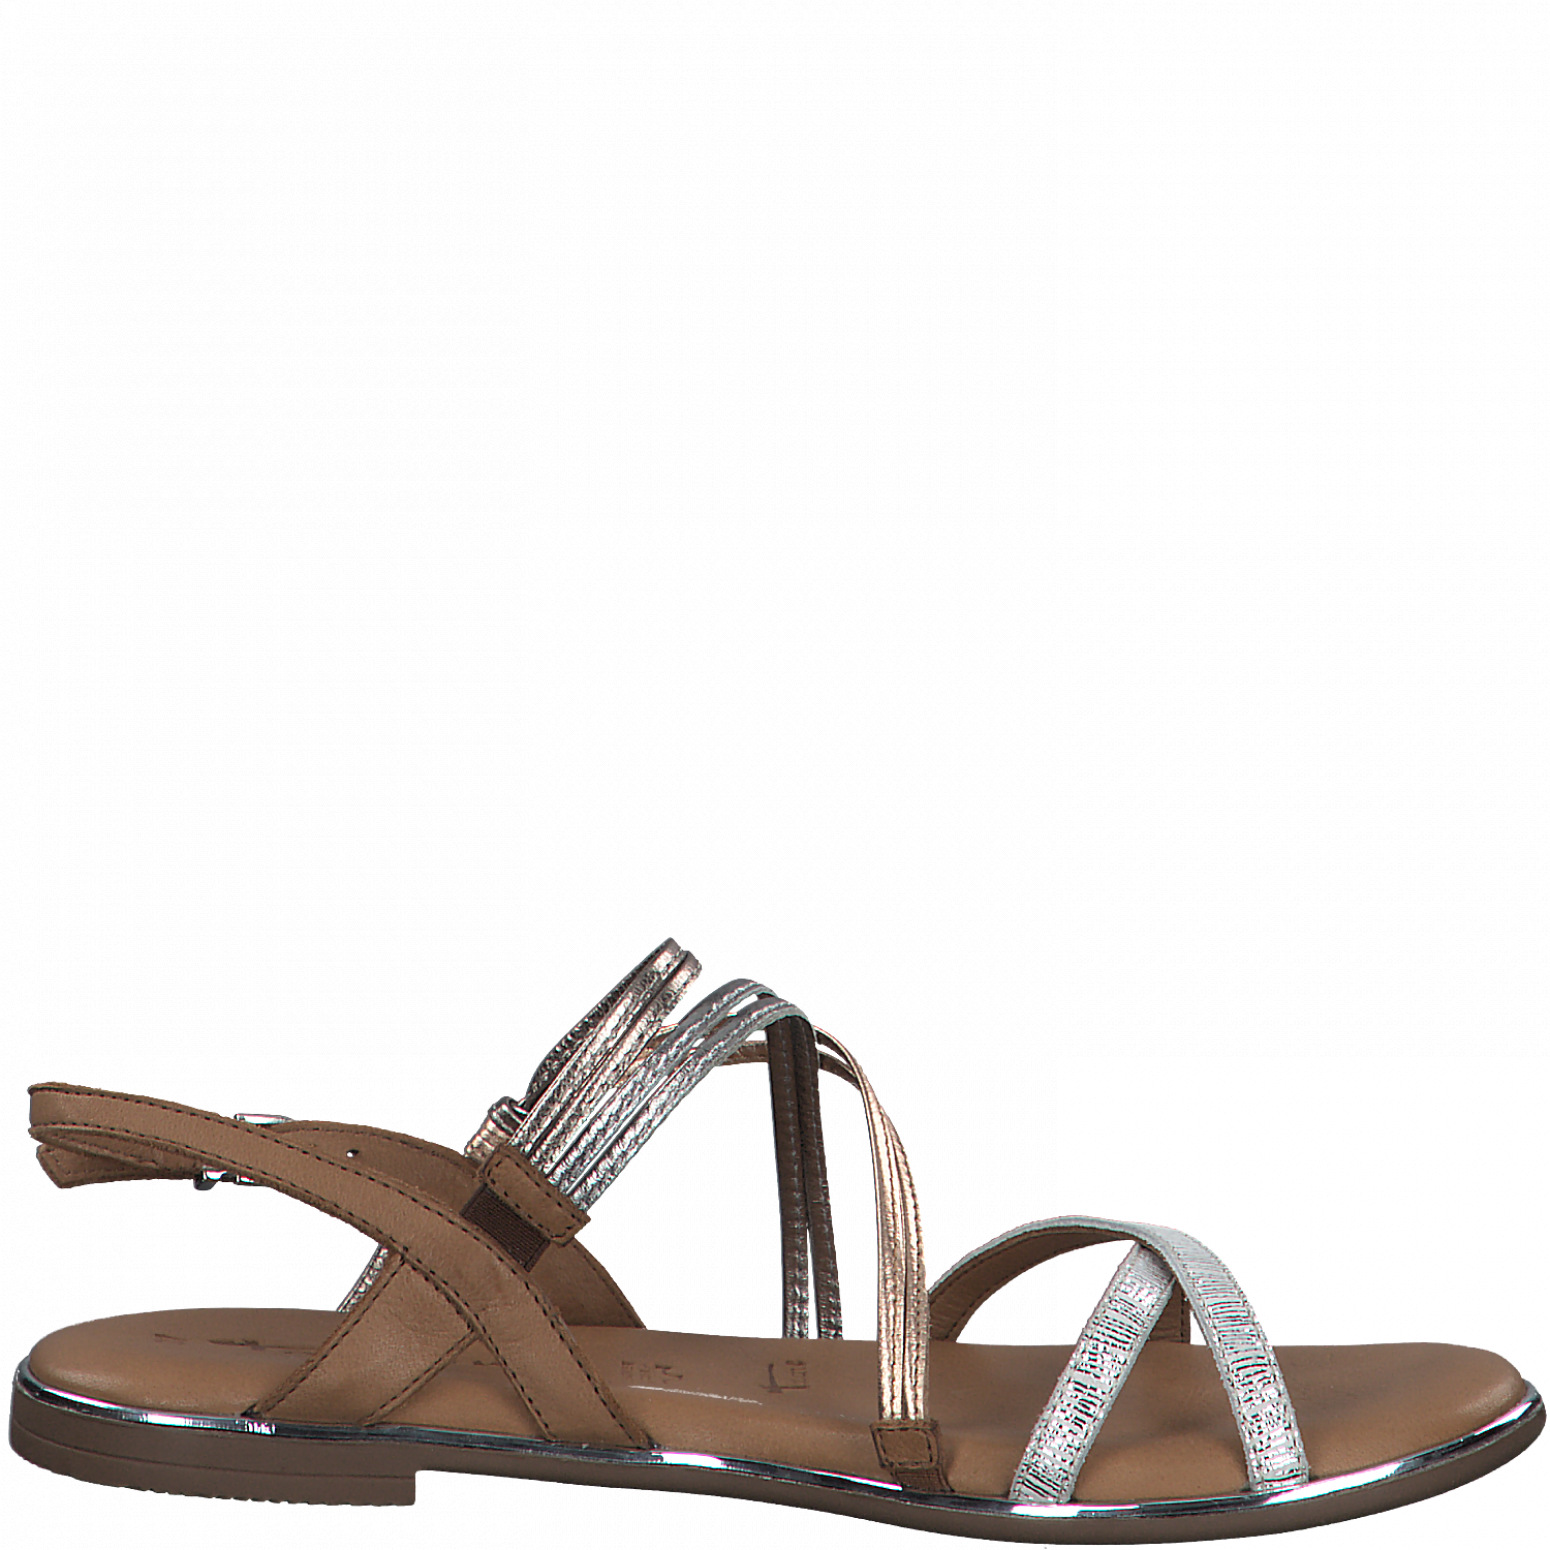 Tamaris 28145 sandal, silver comb, 36